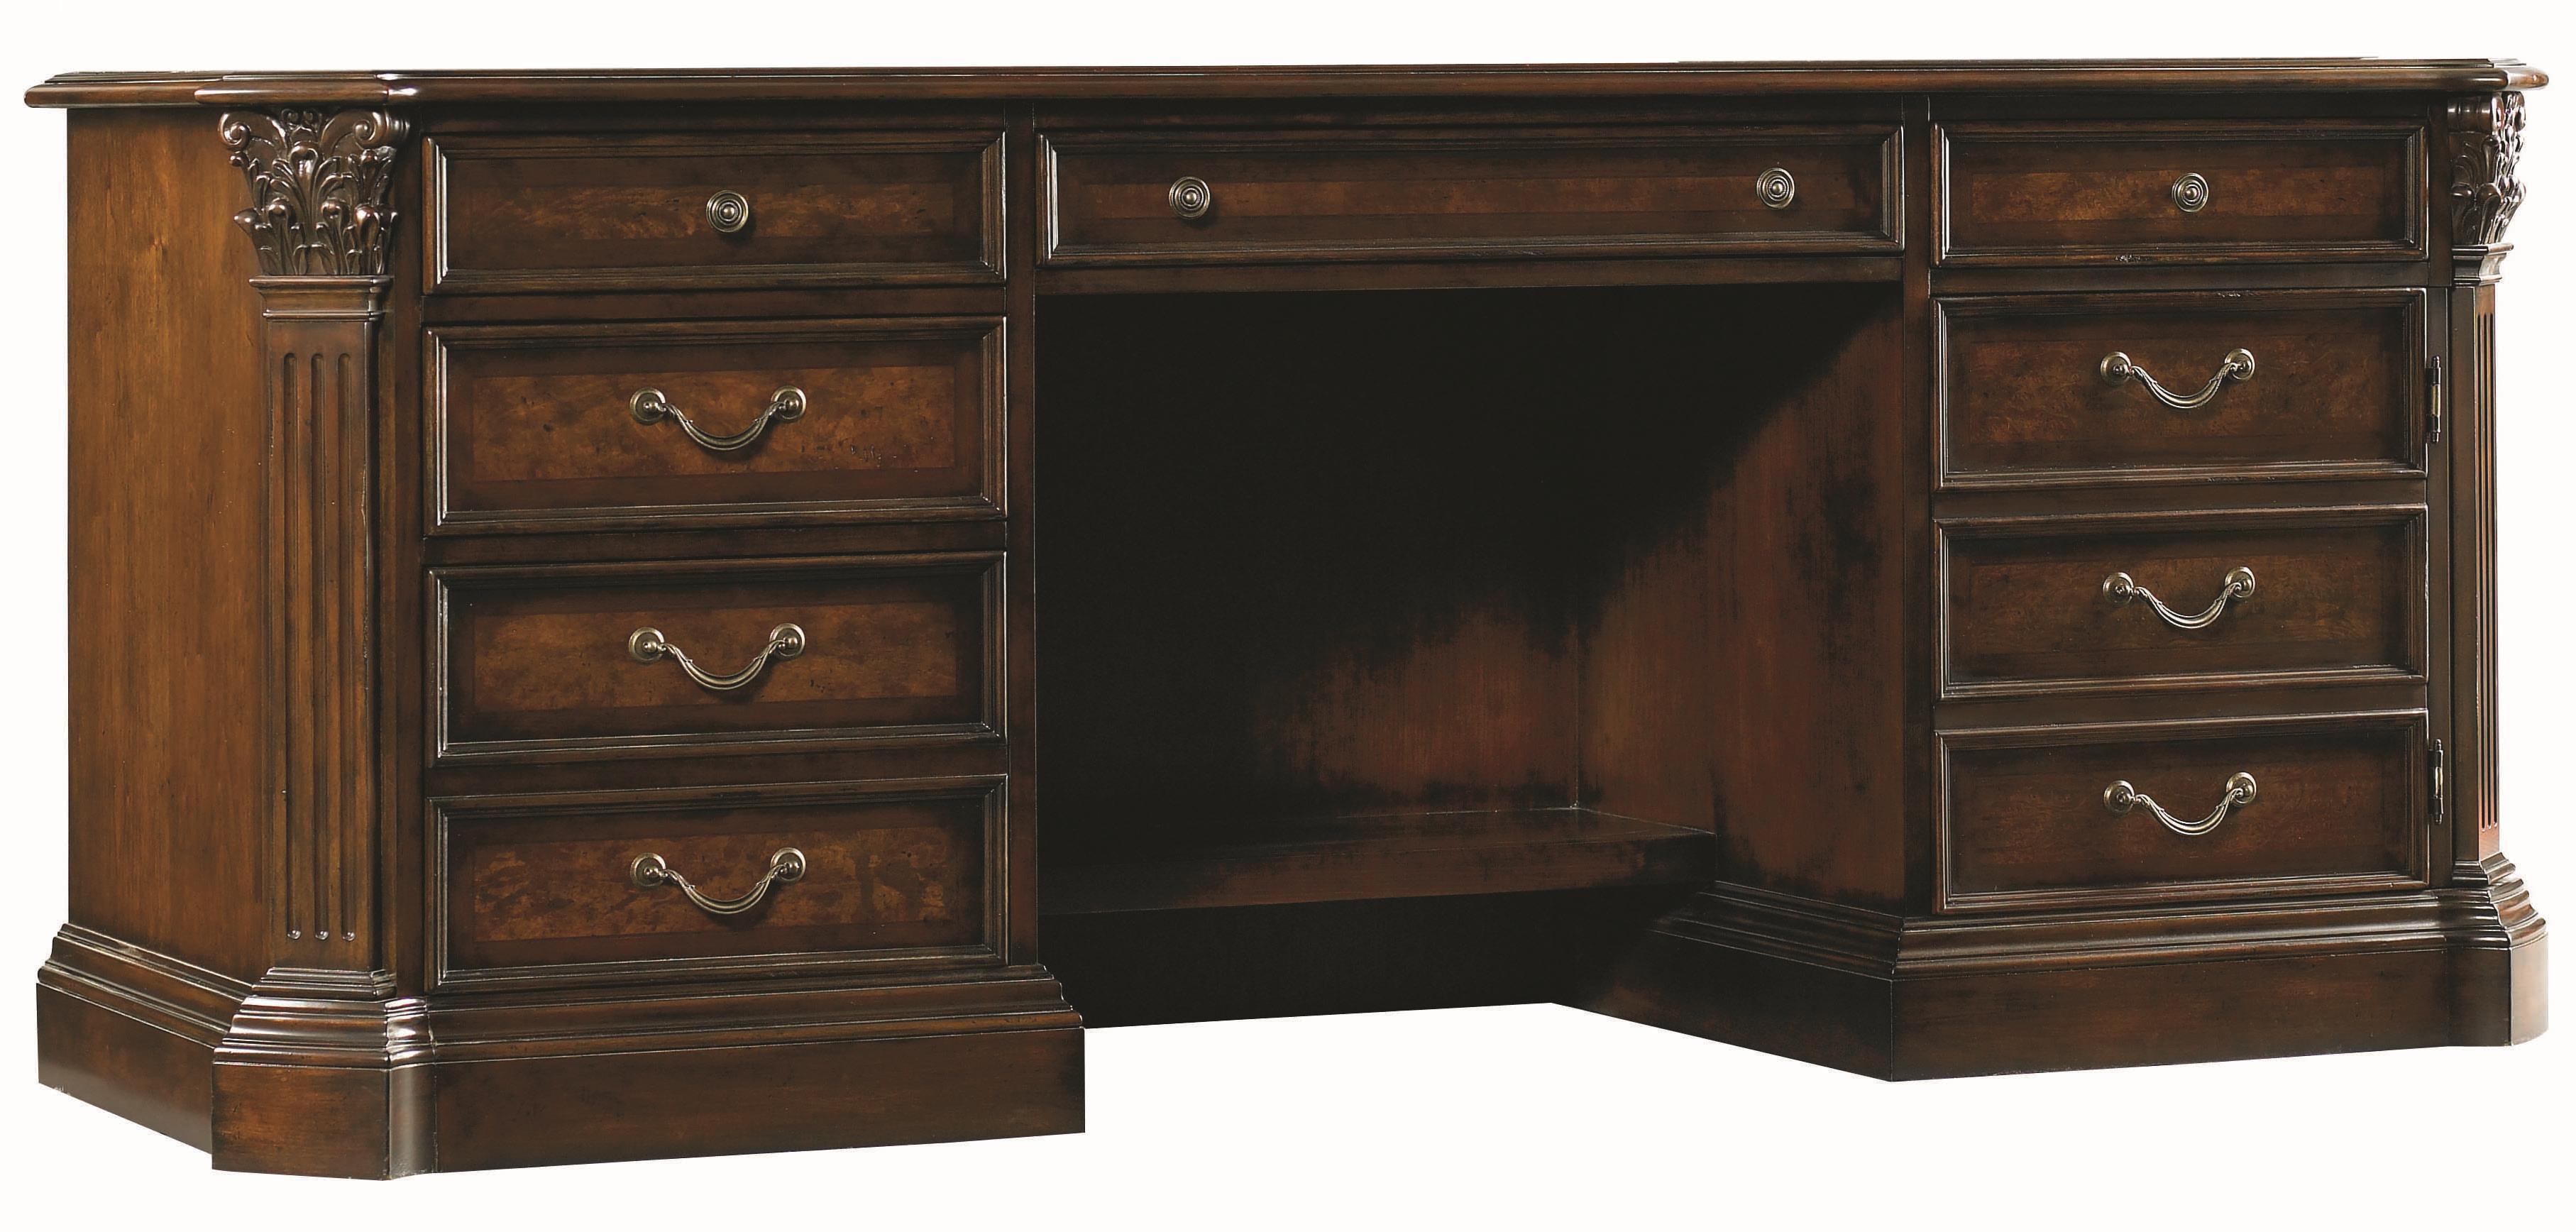 European Renaissance II Computer Credenza by Hooker Furniture at Baer's Furniture